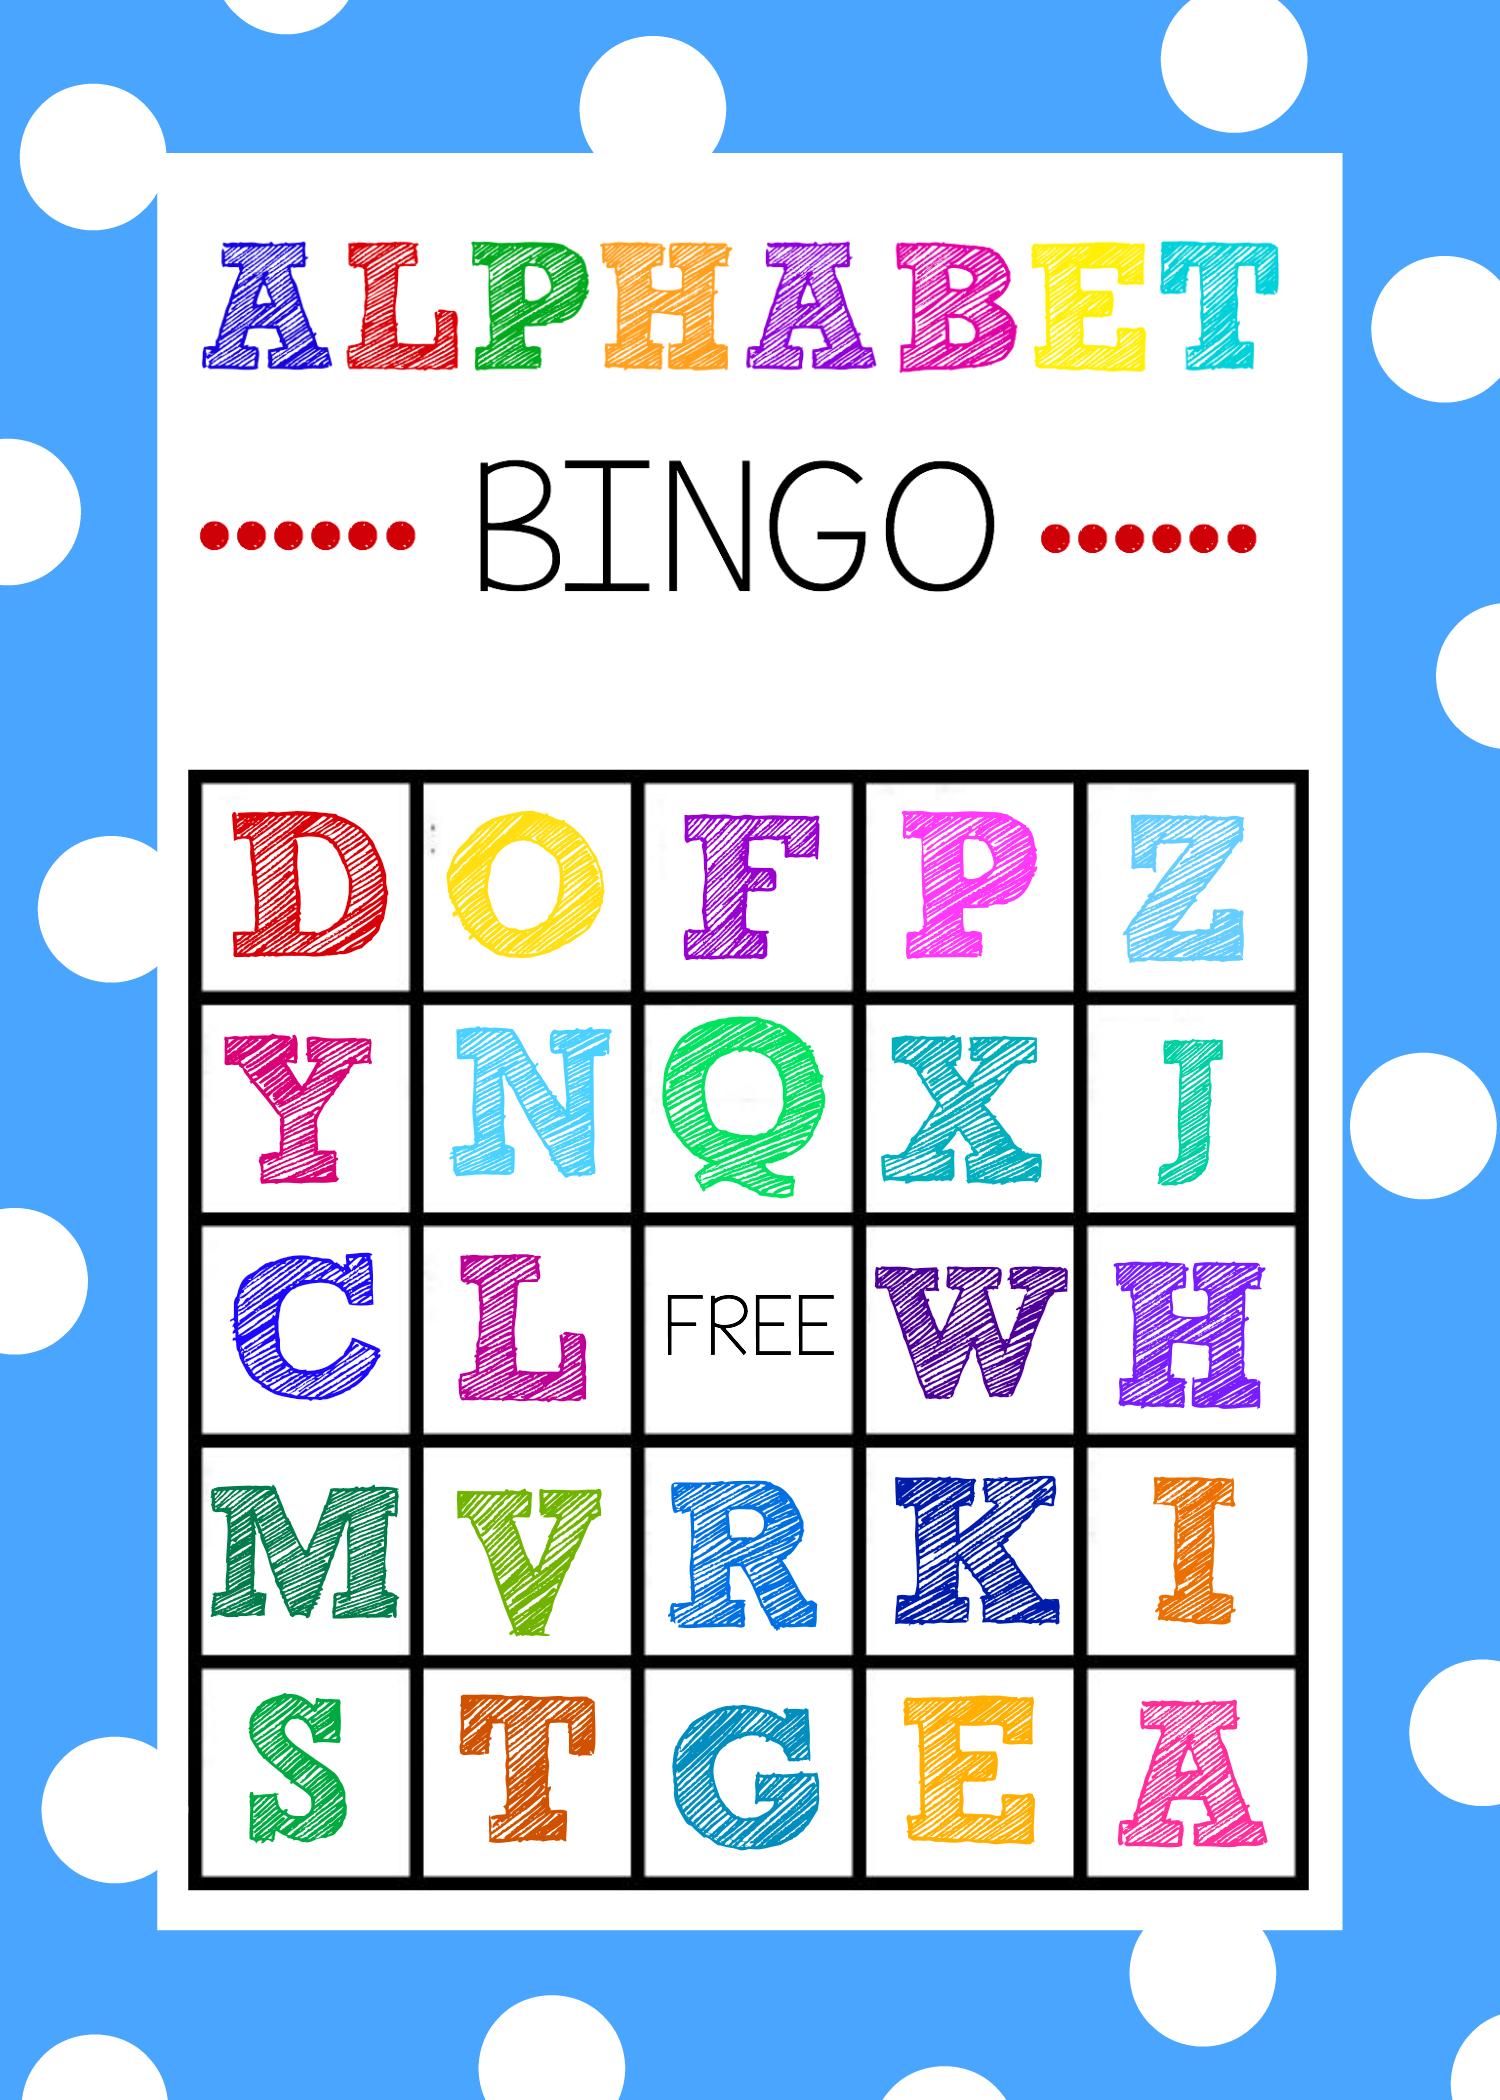 Free Alphabet Bingo Boards. Such A Fun Abc Game For Kids! | Abc - Free Printable Alphabet Board Games